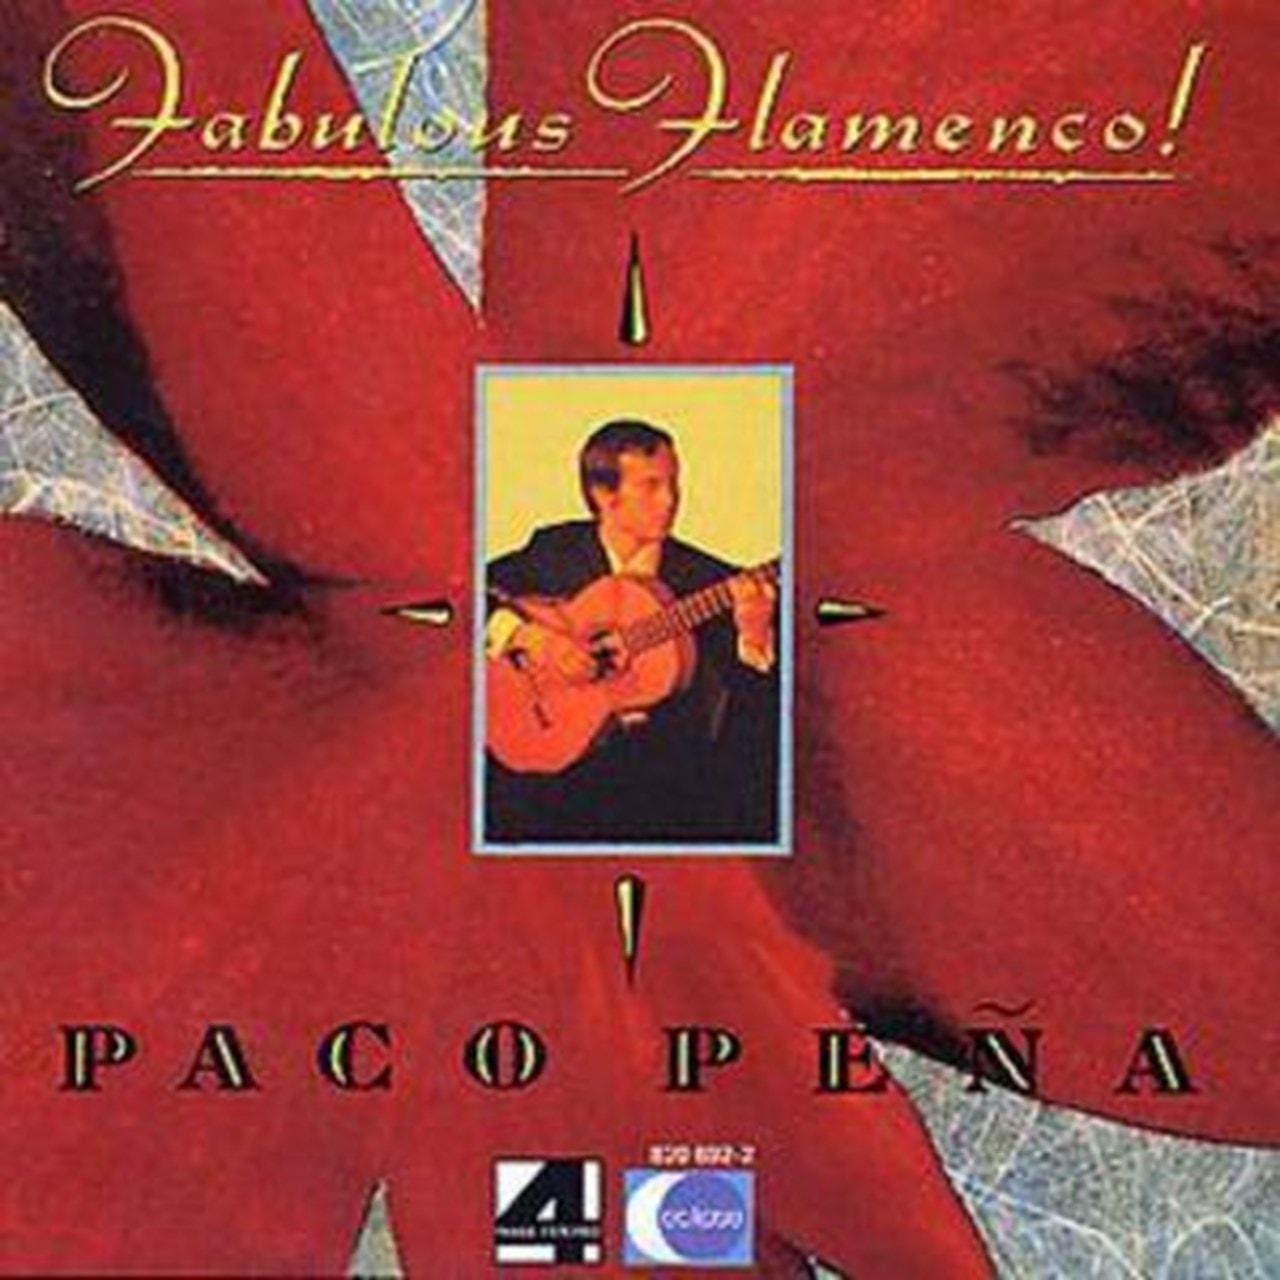 Fabulous Flamenco - 1